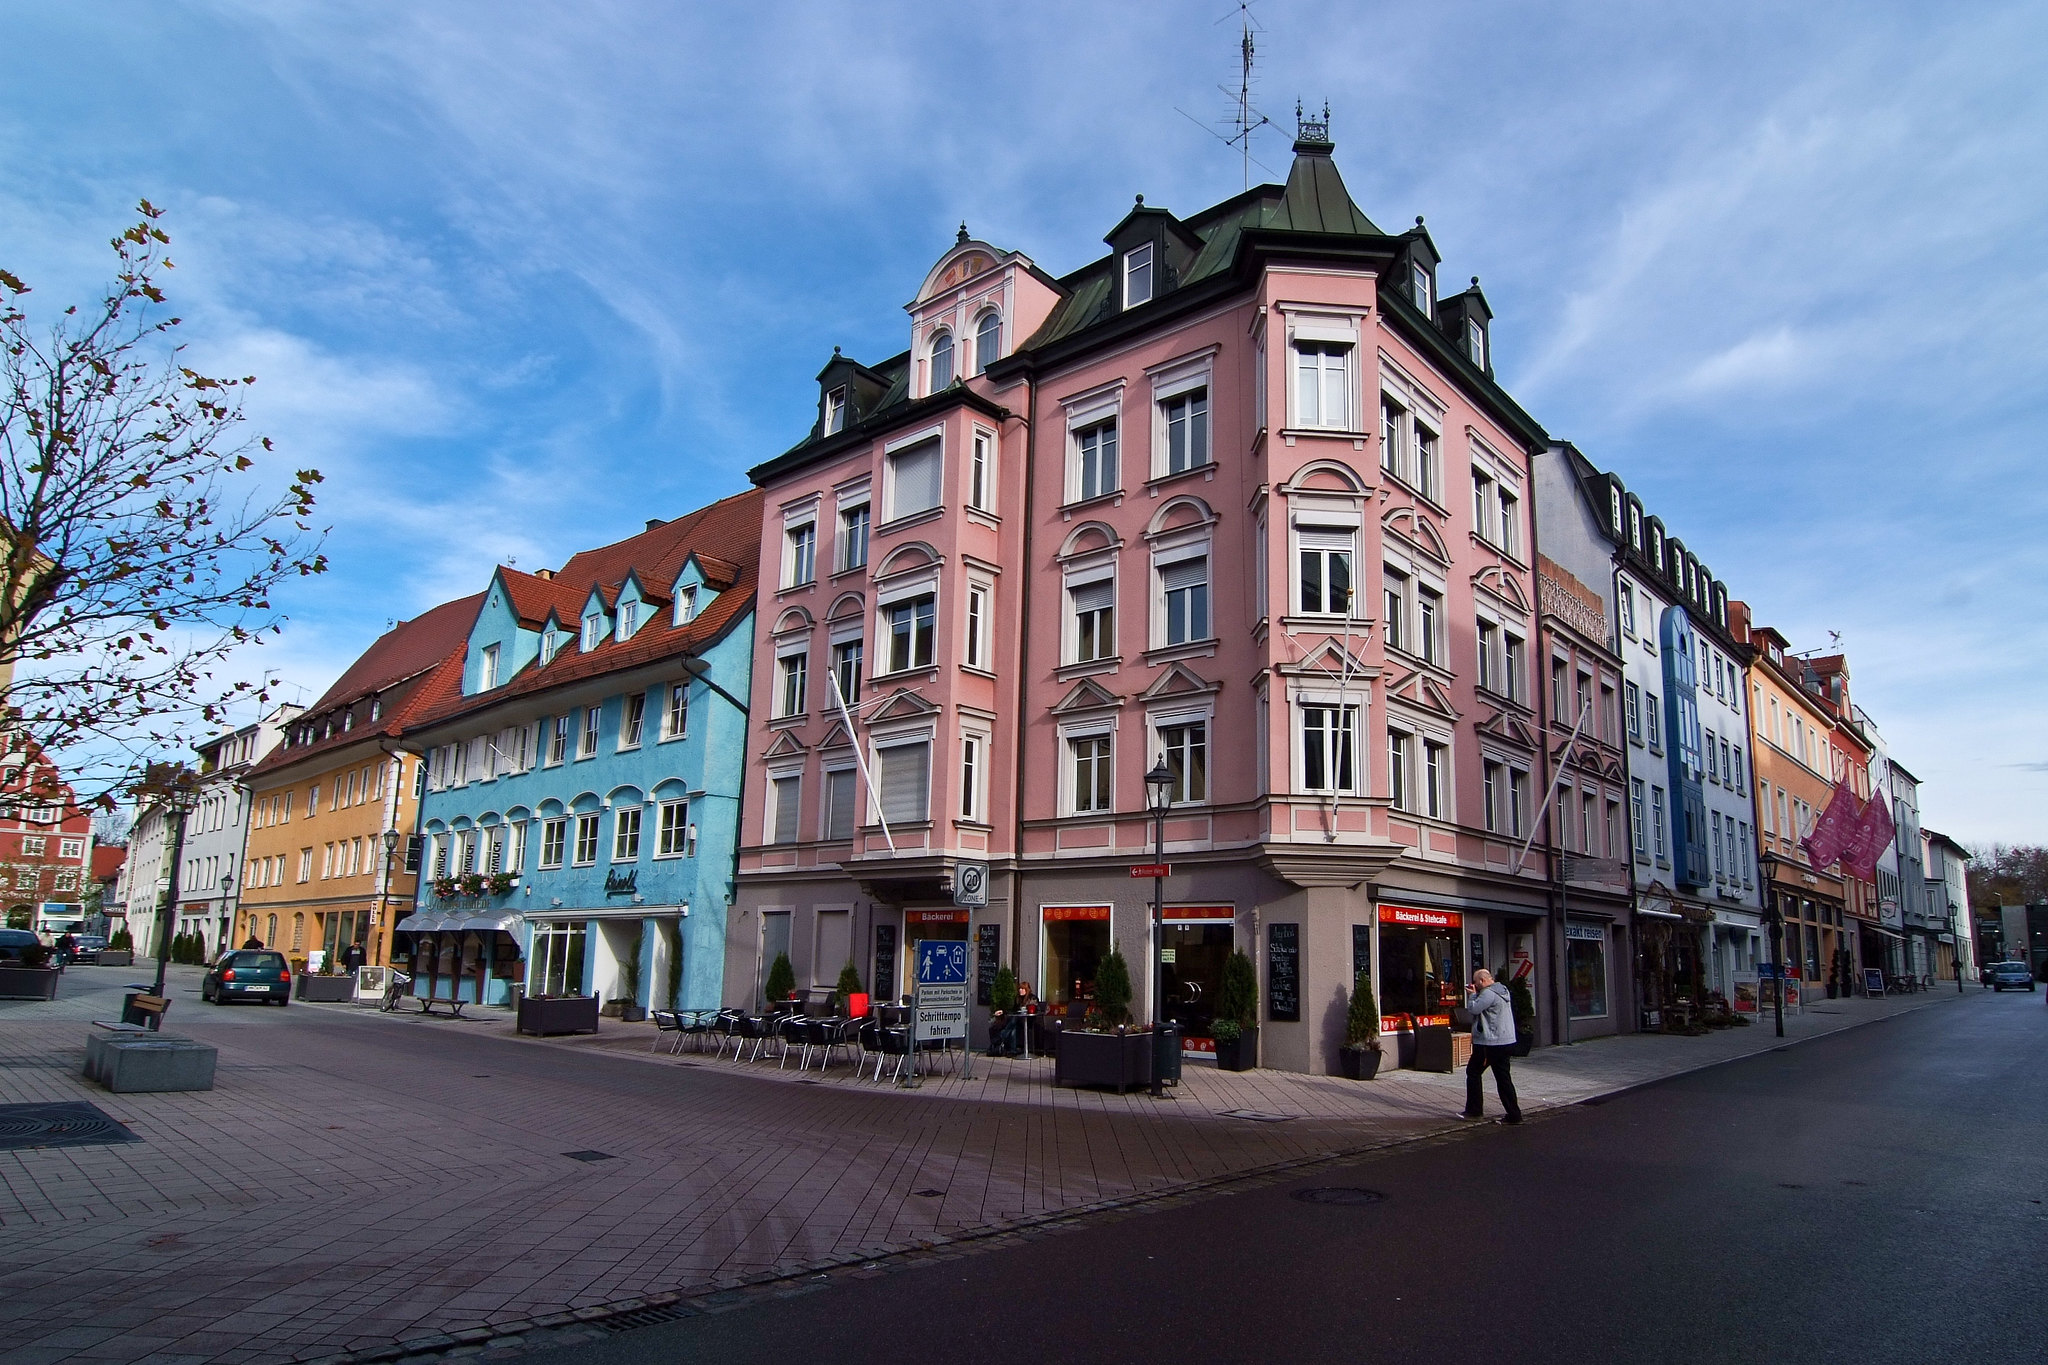 Weekend in Memmingen, Germany